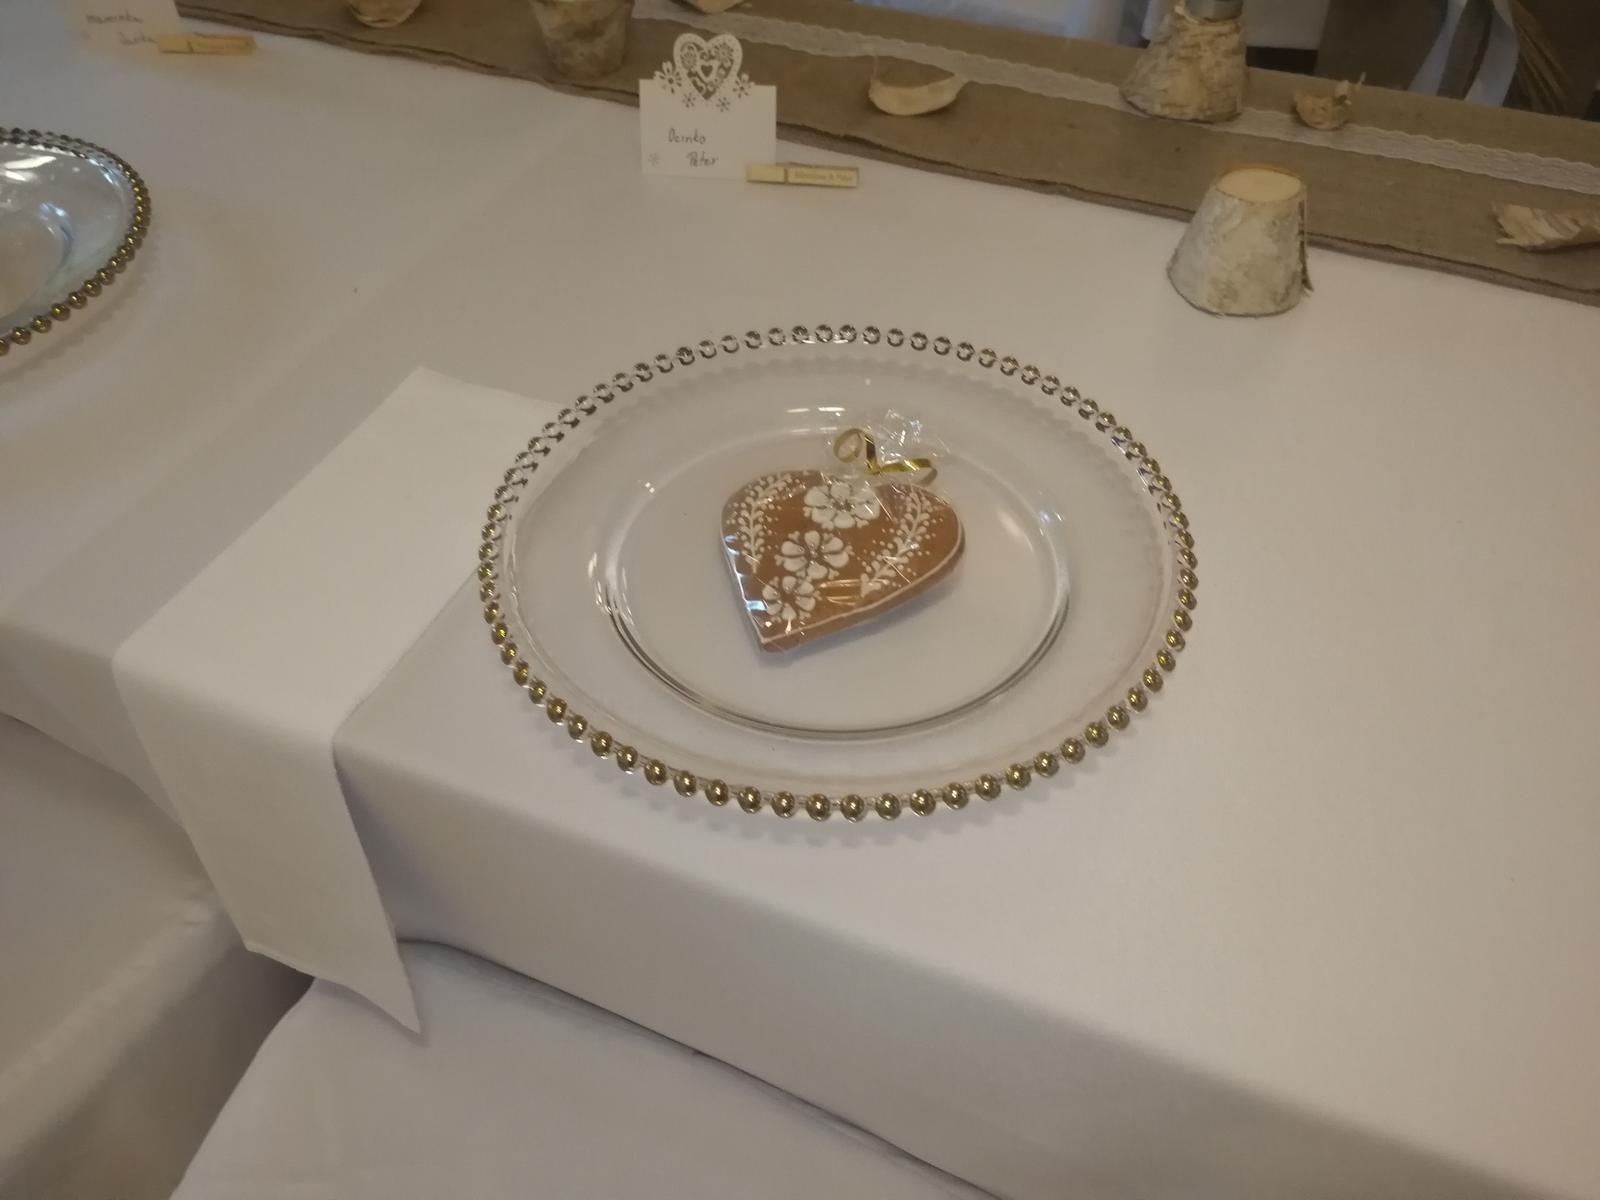 Luxusné klubové taniere  - Obrázok č. 1